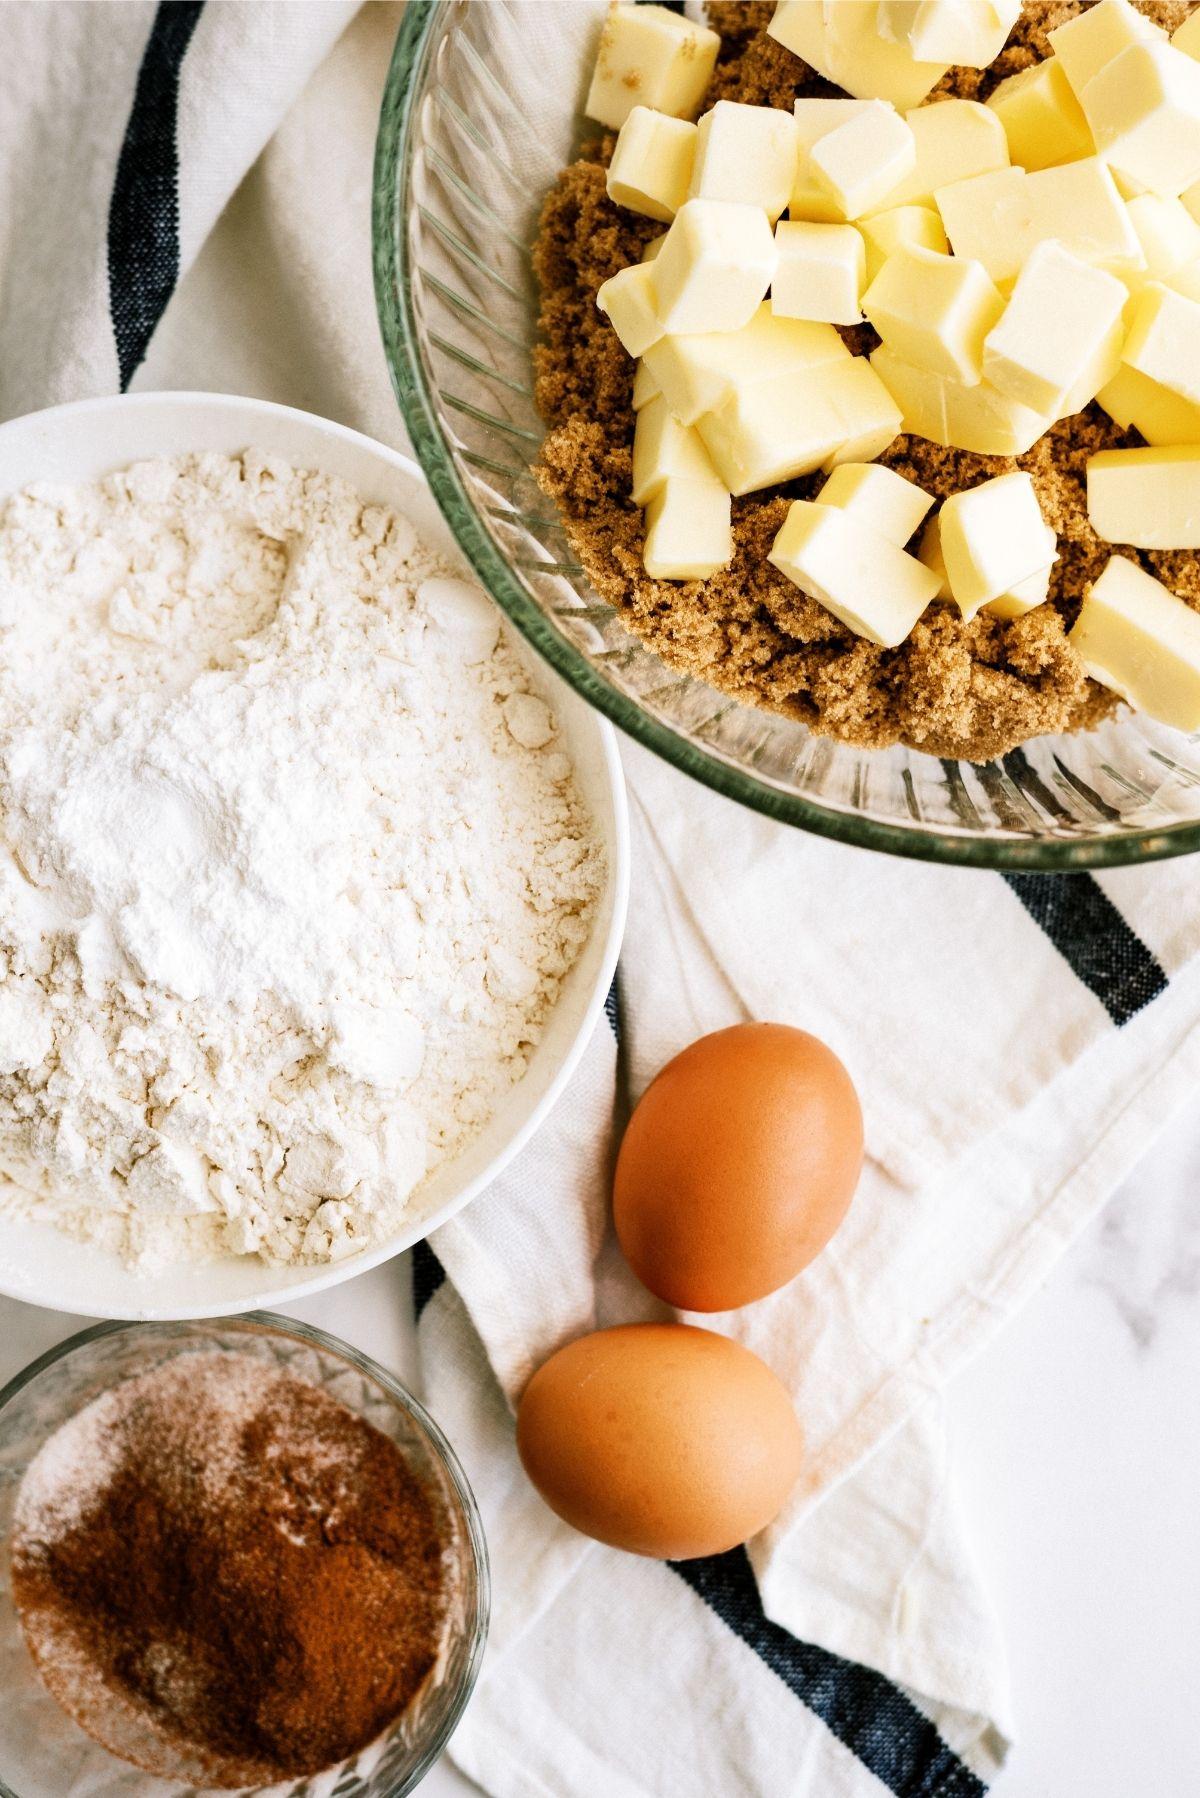 Ingredients for Snickerdoodle Blondies Recipe